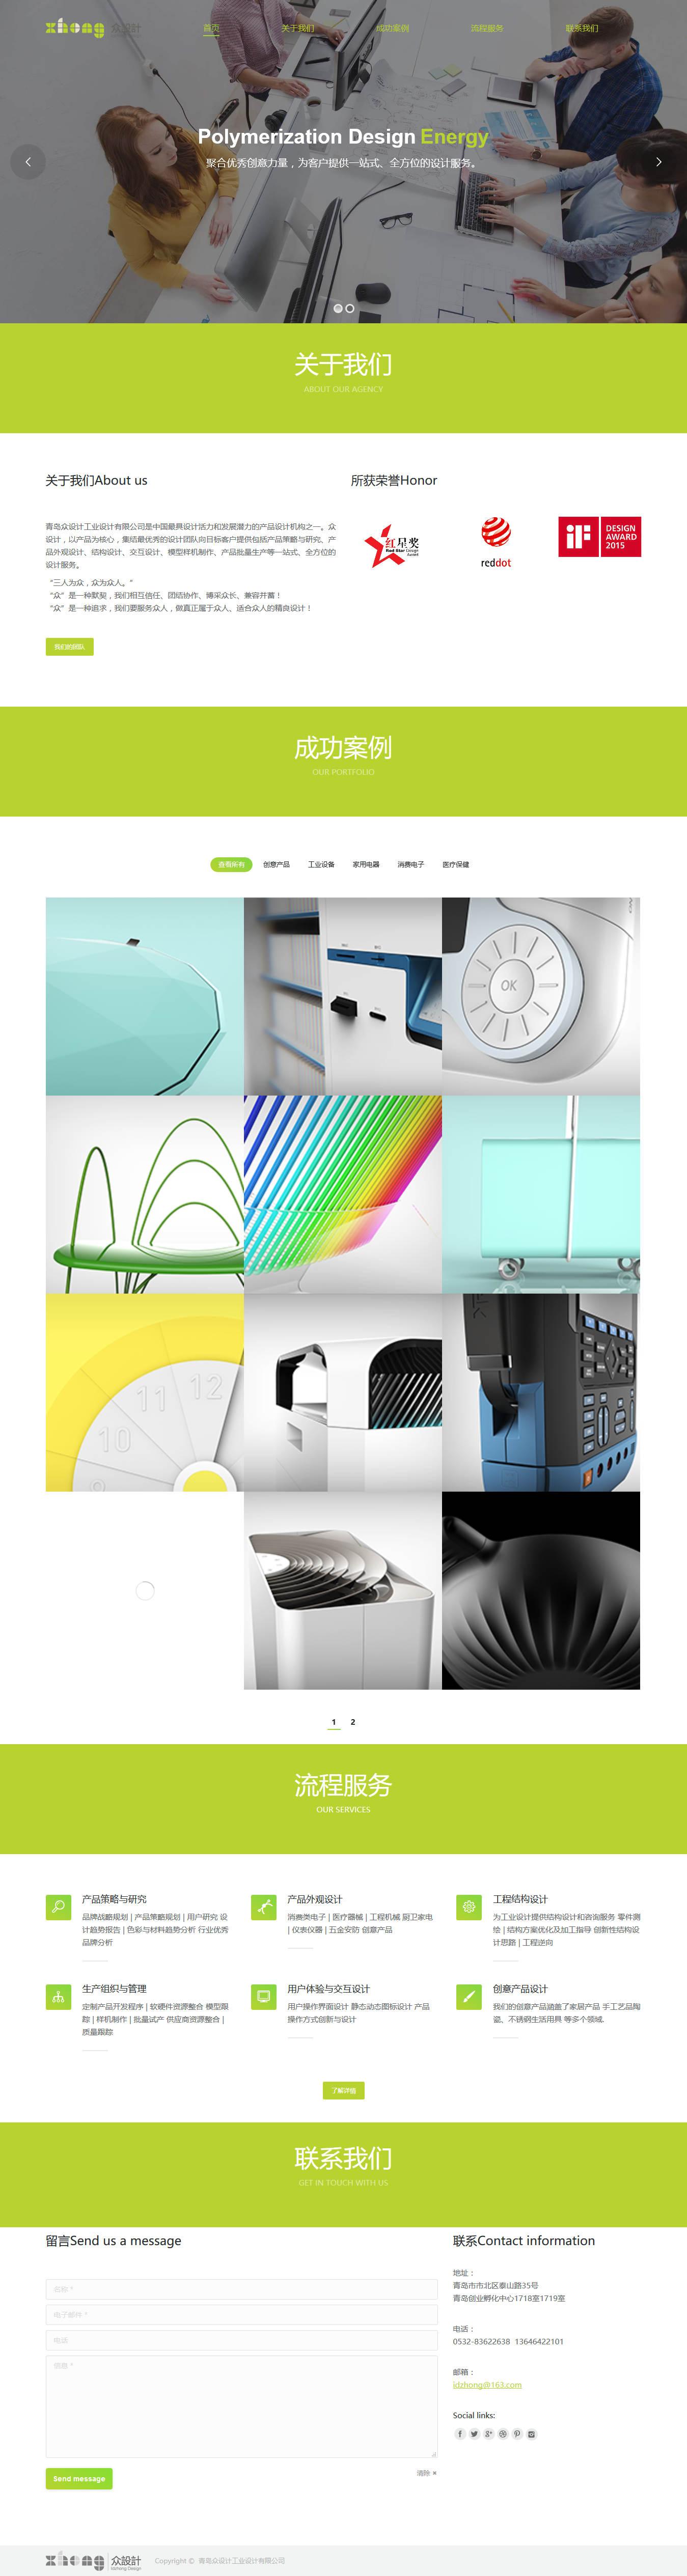 dawdadwa 青岛众设计工业设计有限公司